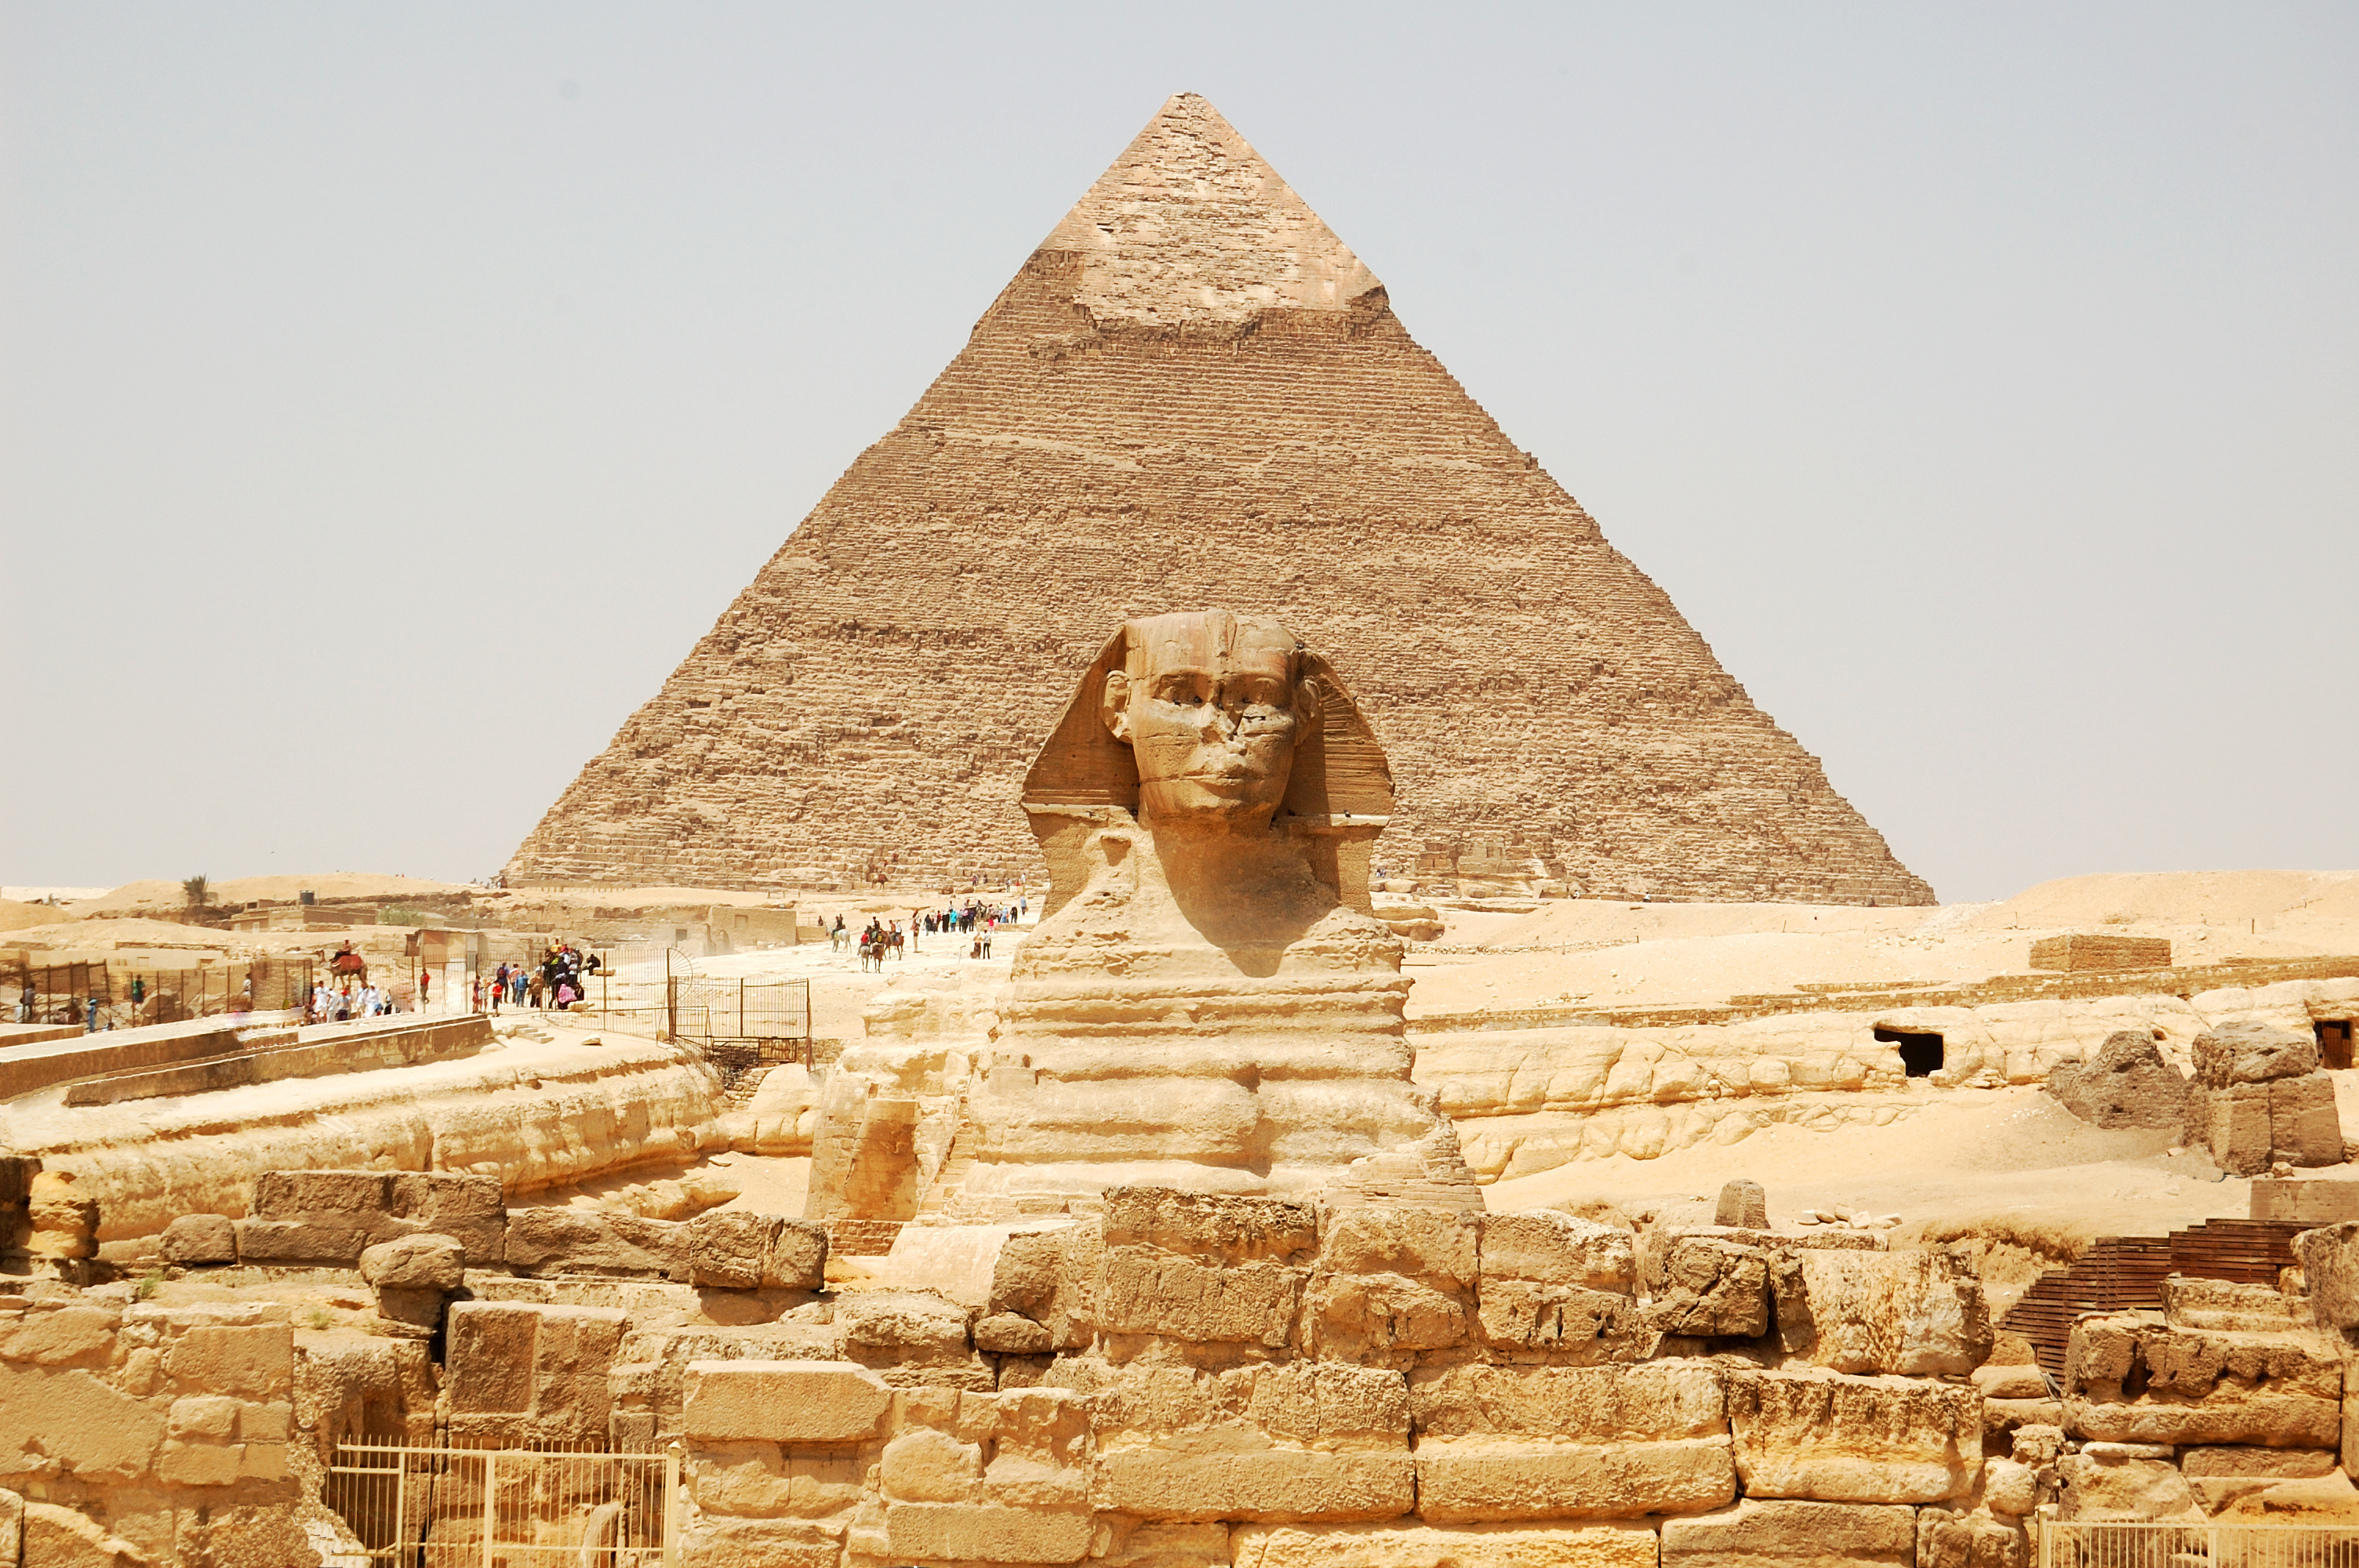 Le Sphinx et la pyramide de Gizeh © Dmtriy /Adobe Stock